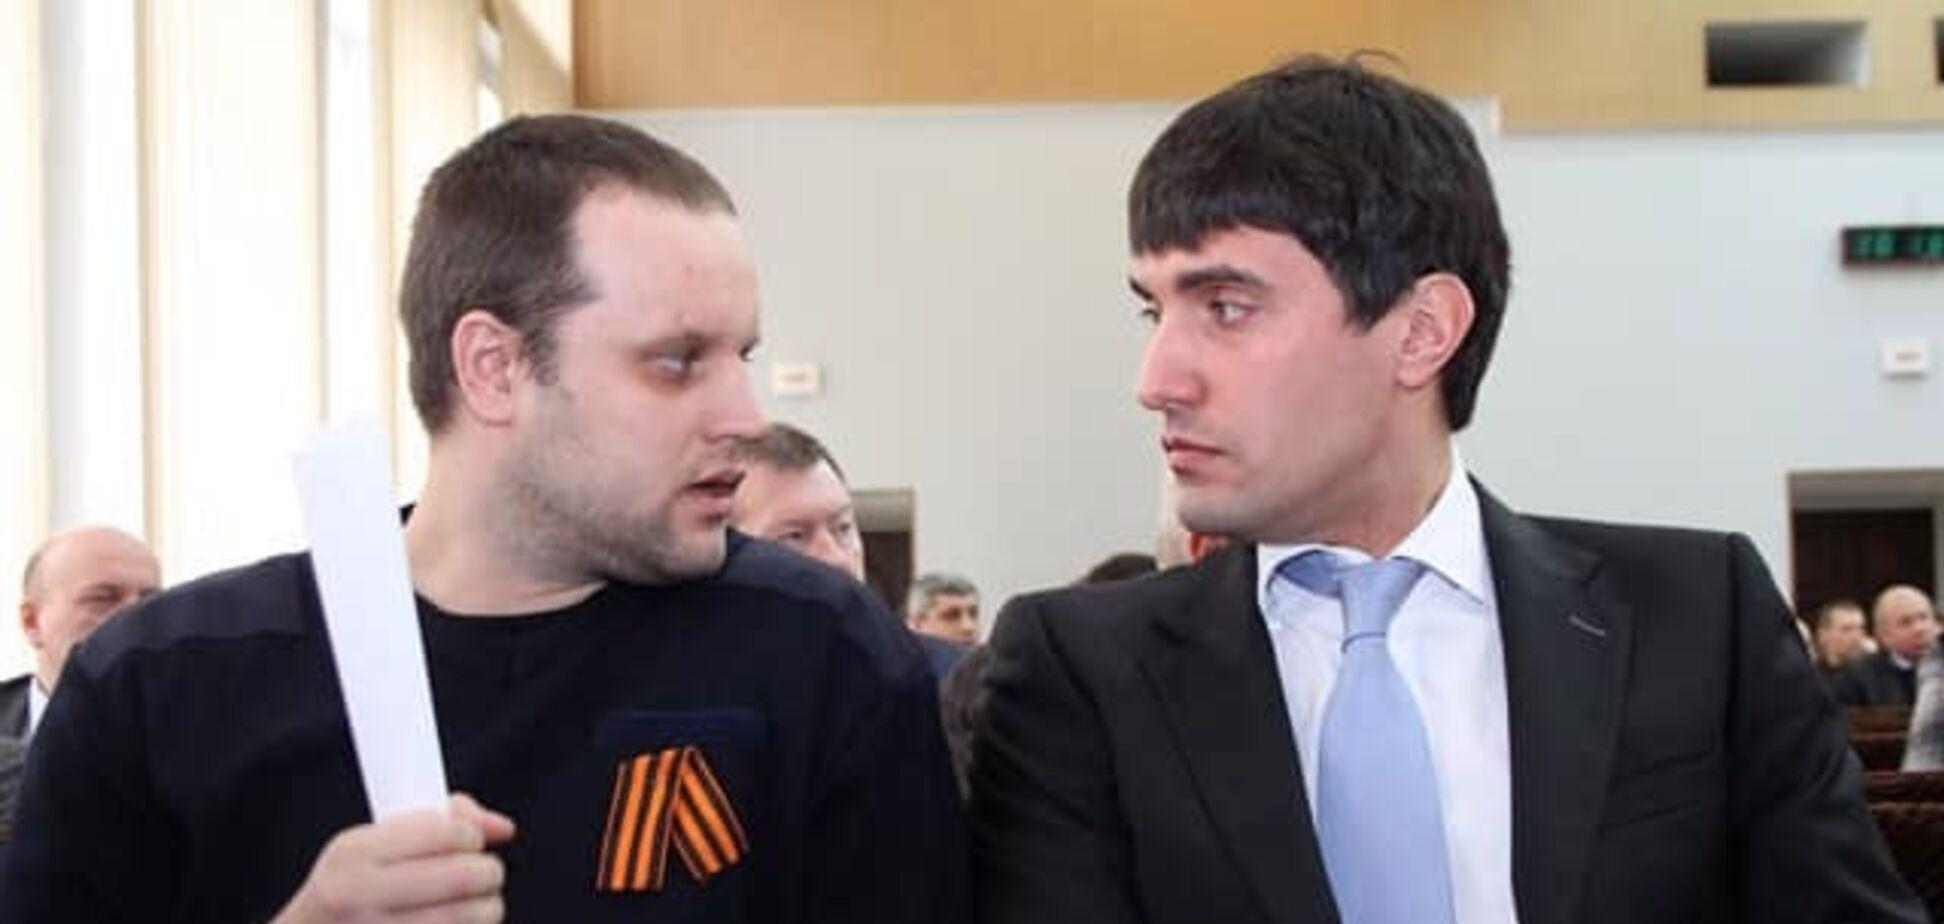 Экс-регионал Николай Левченко и террорист 'ДНР' Павел Губарев